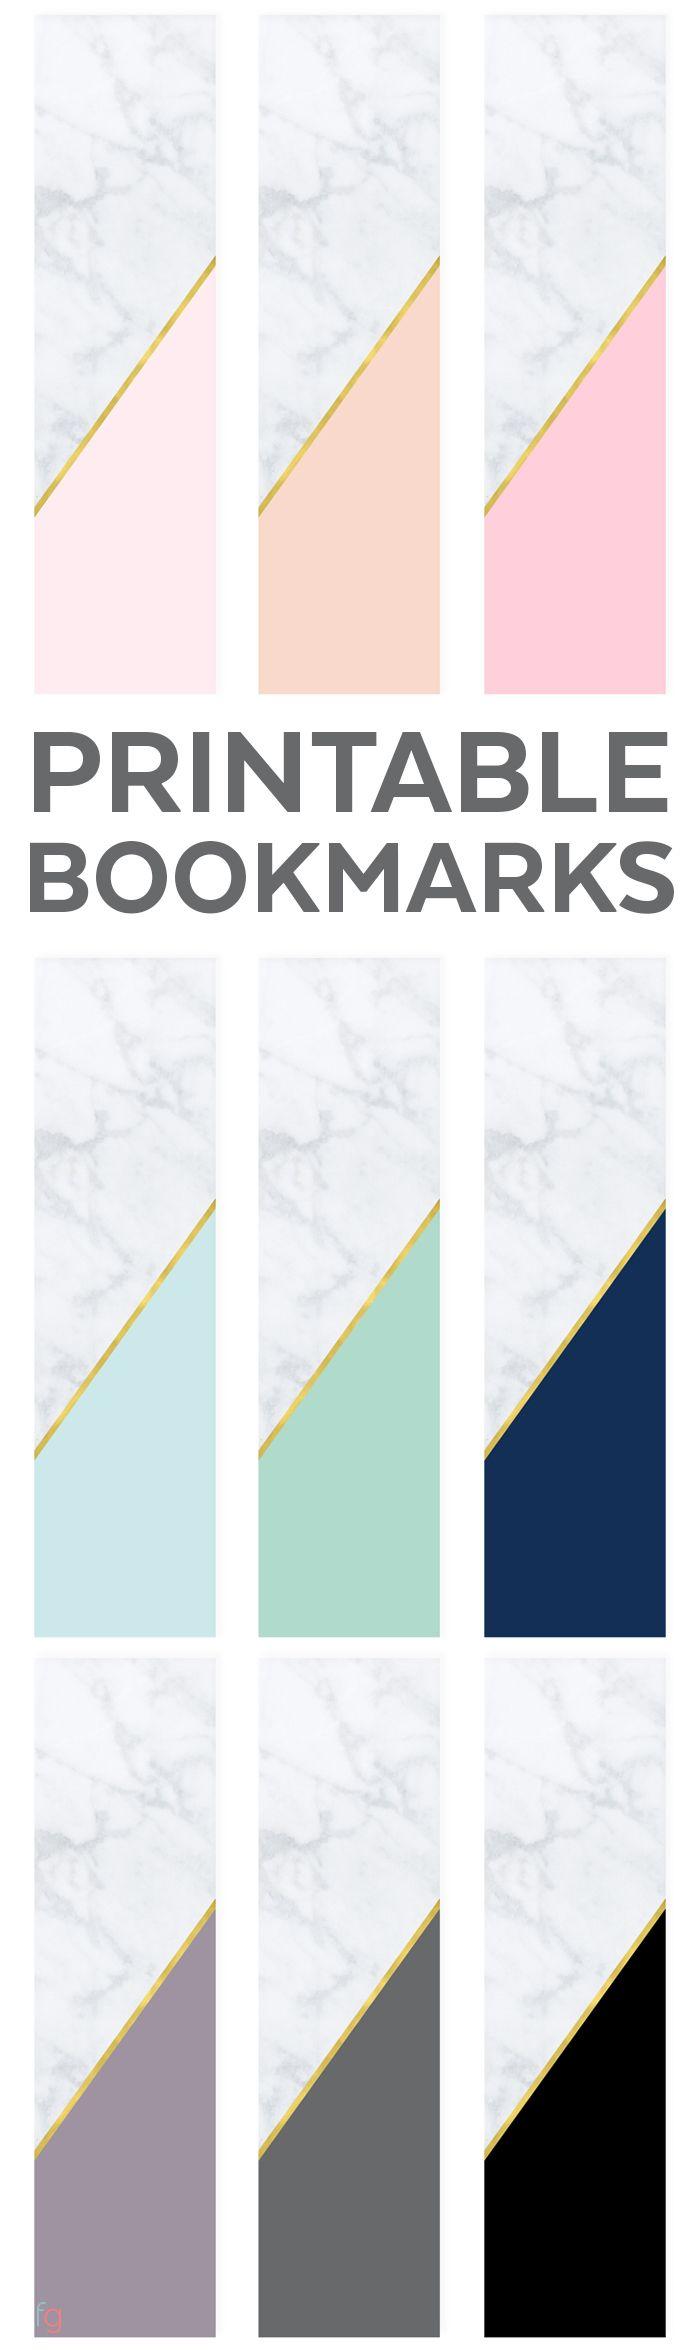 Bookmarks Printable Free Printable Bookmarks Free Book Lovers Free Printable Bookmarks For Free Printable Bookmarks Bookmarks Printable Bookmark Printing